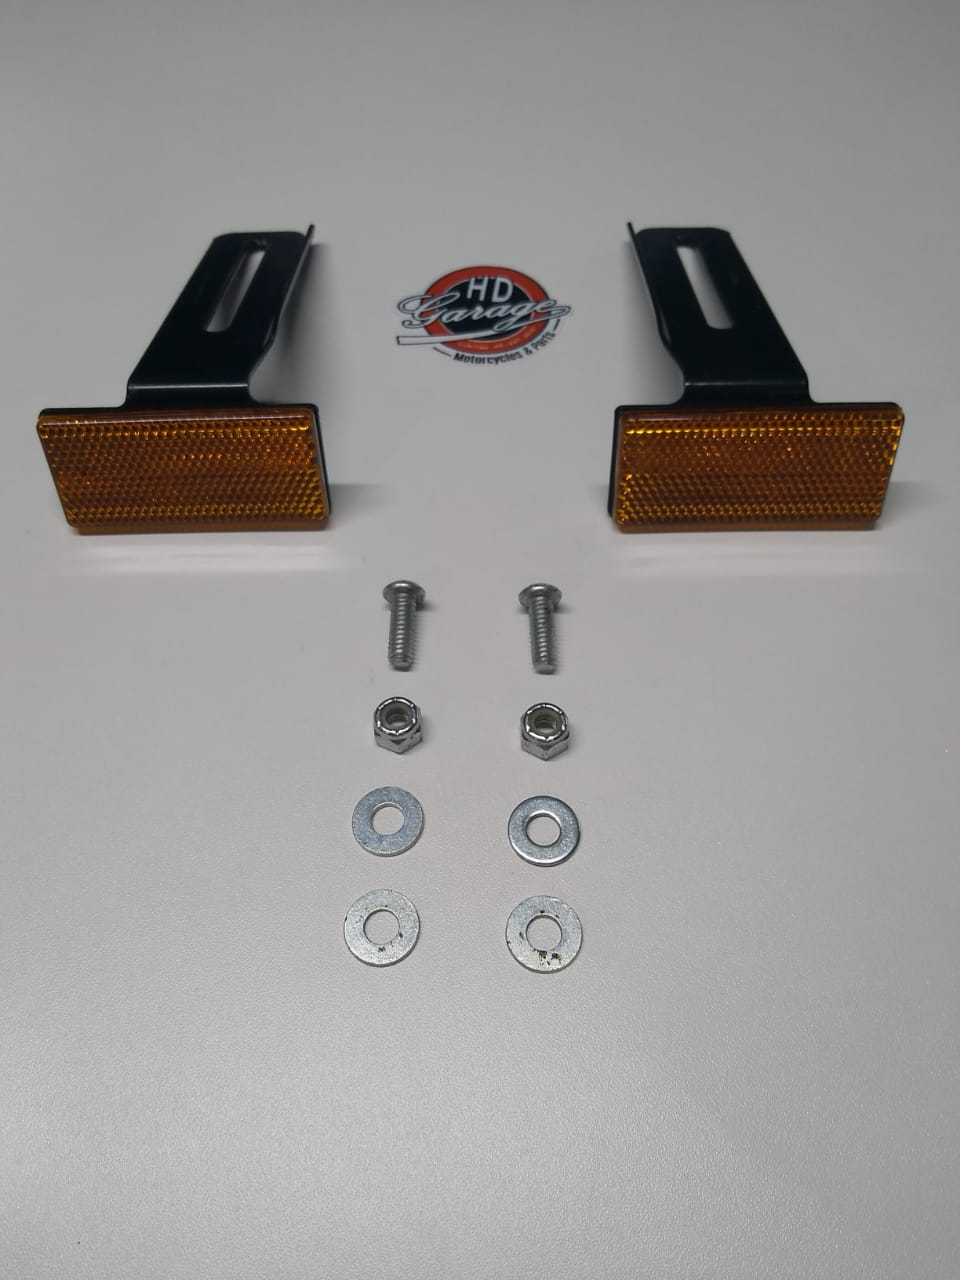 Refletivos Laterais de Placa - HD Iron - Cor Laranja - 001/99200